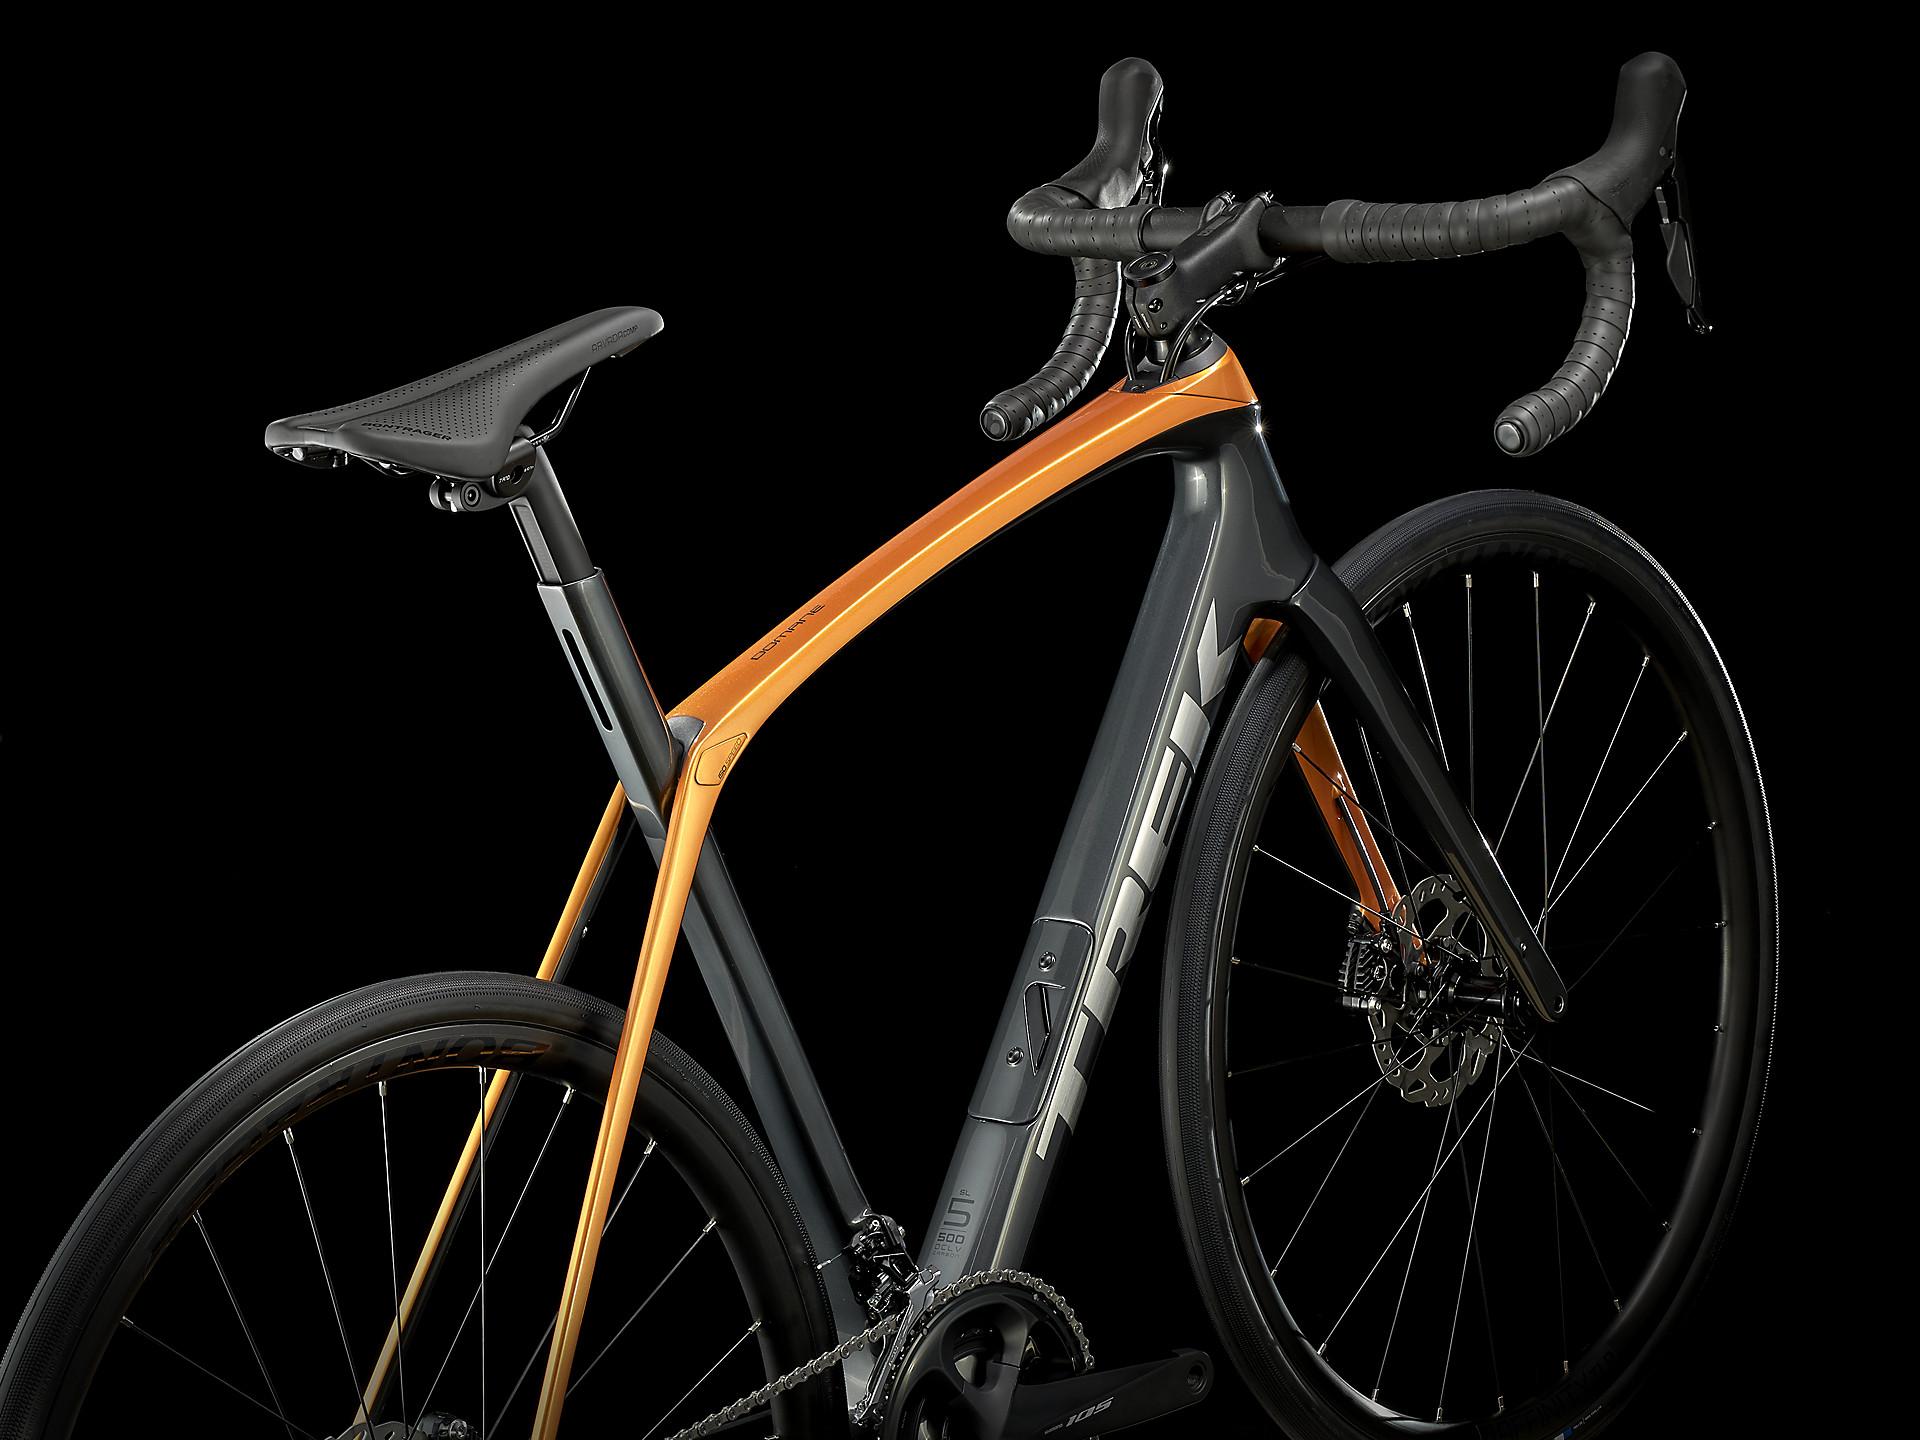 Trek Domane Sl 5 Disc Carbon Road Bike 2021 In Grey